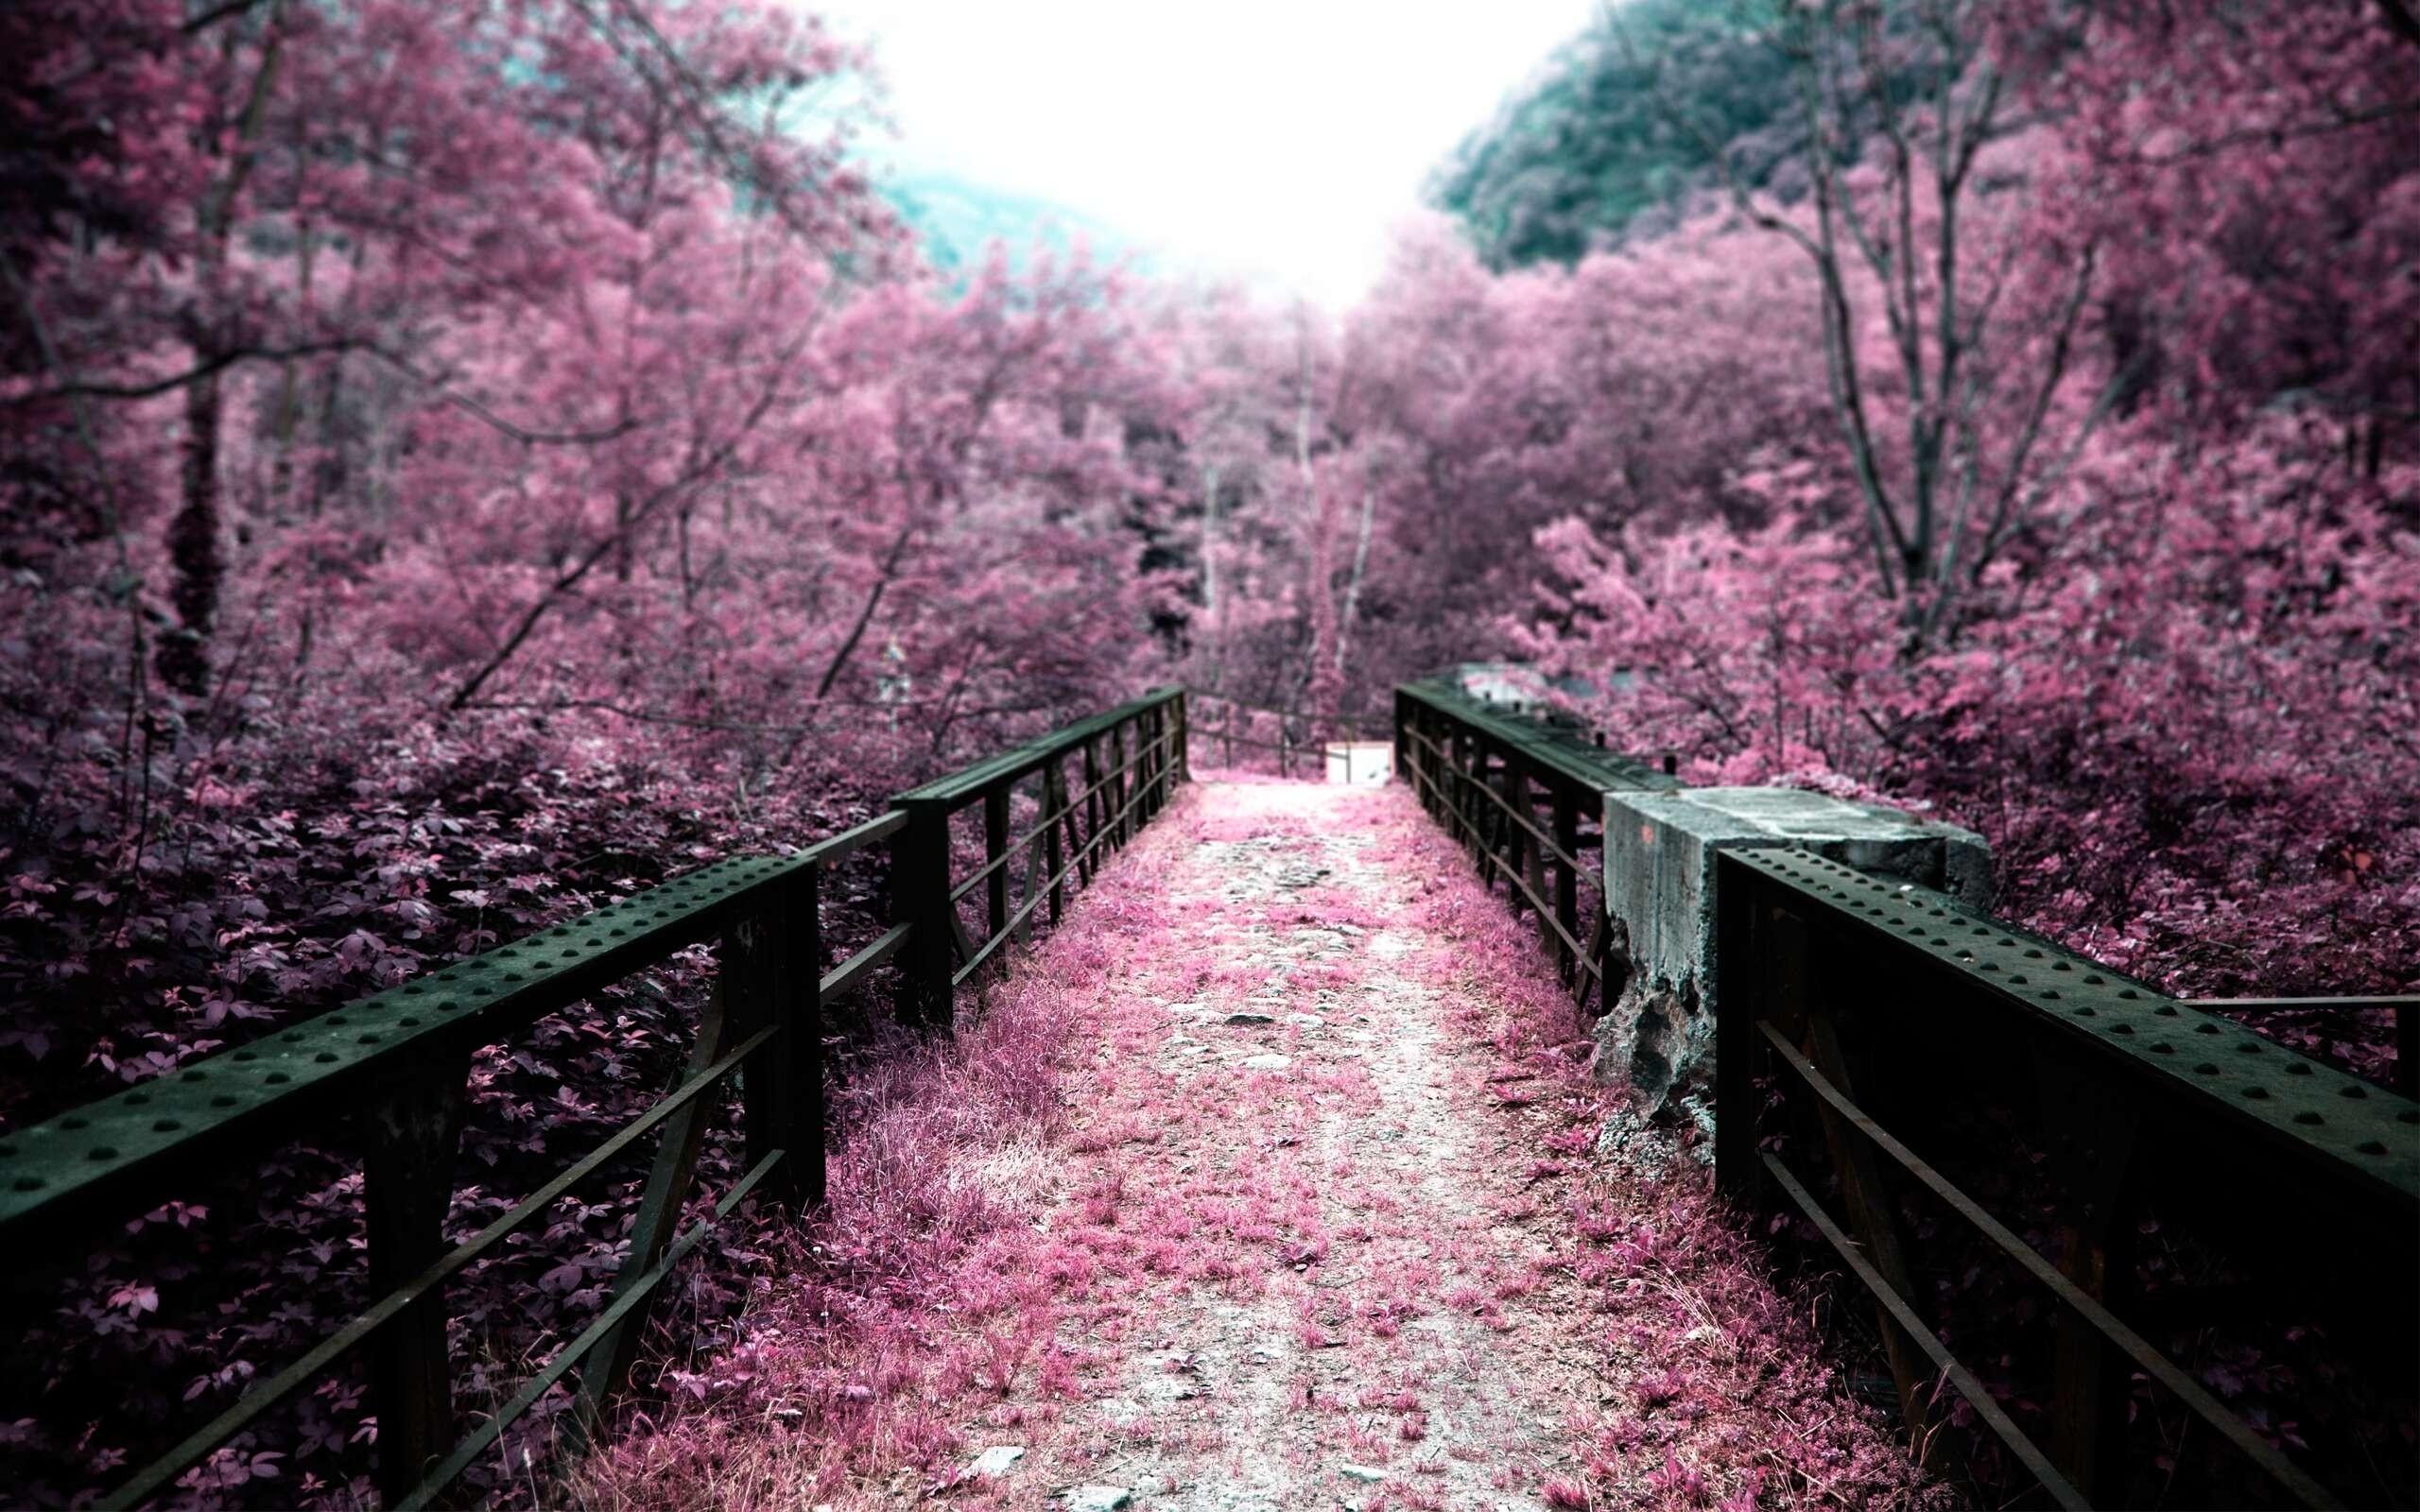 Cherry Blossom Tree Wallpaper Cherry blossoms on a bridge hd 2560x1600